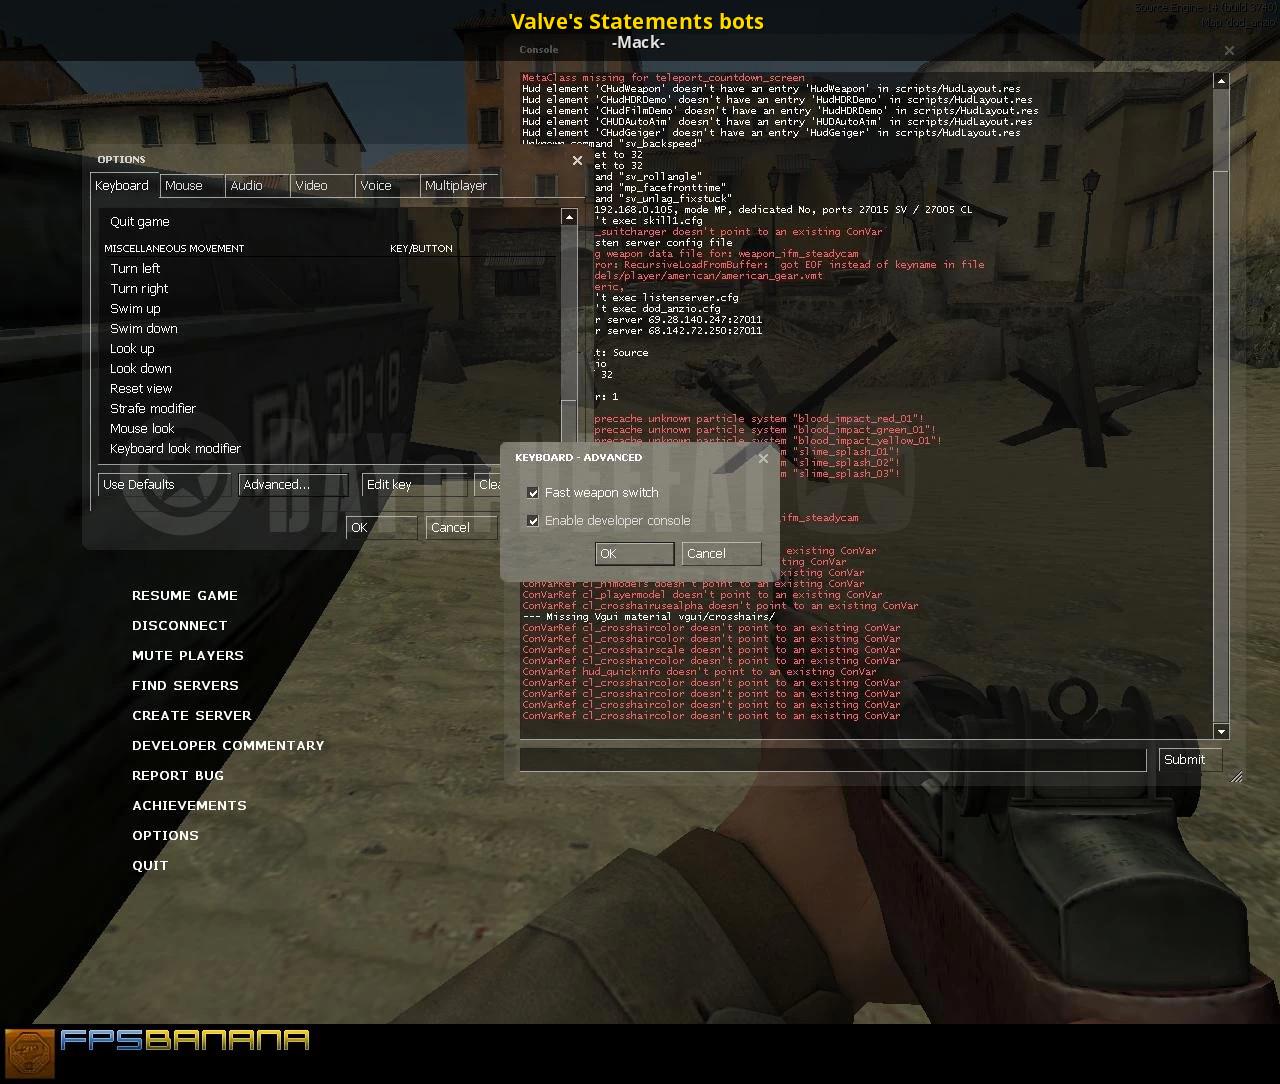 How to spawn a bot in gmod   Sandbox  2019-03-17